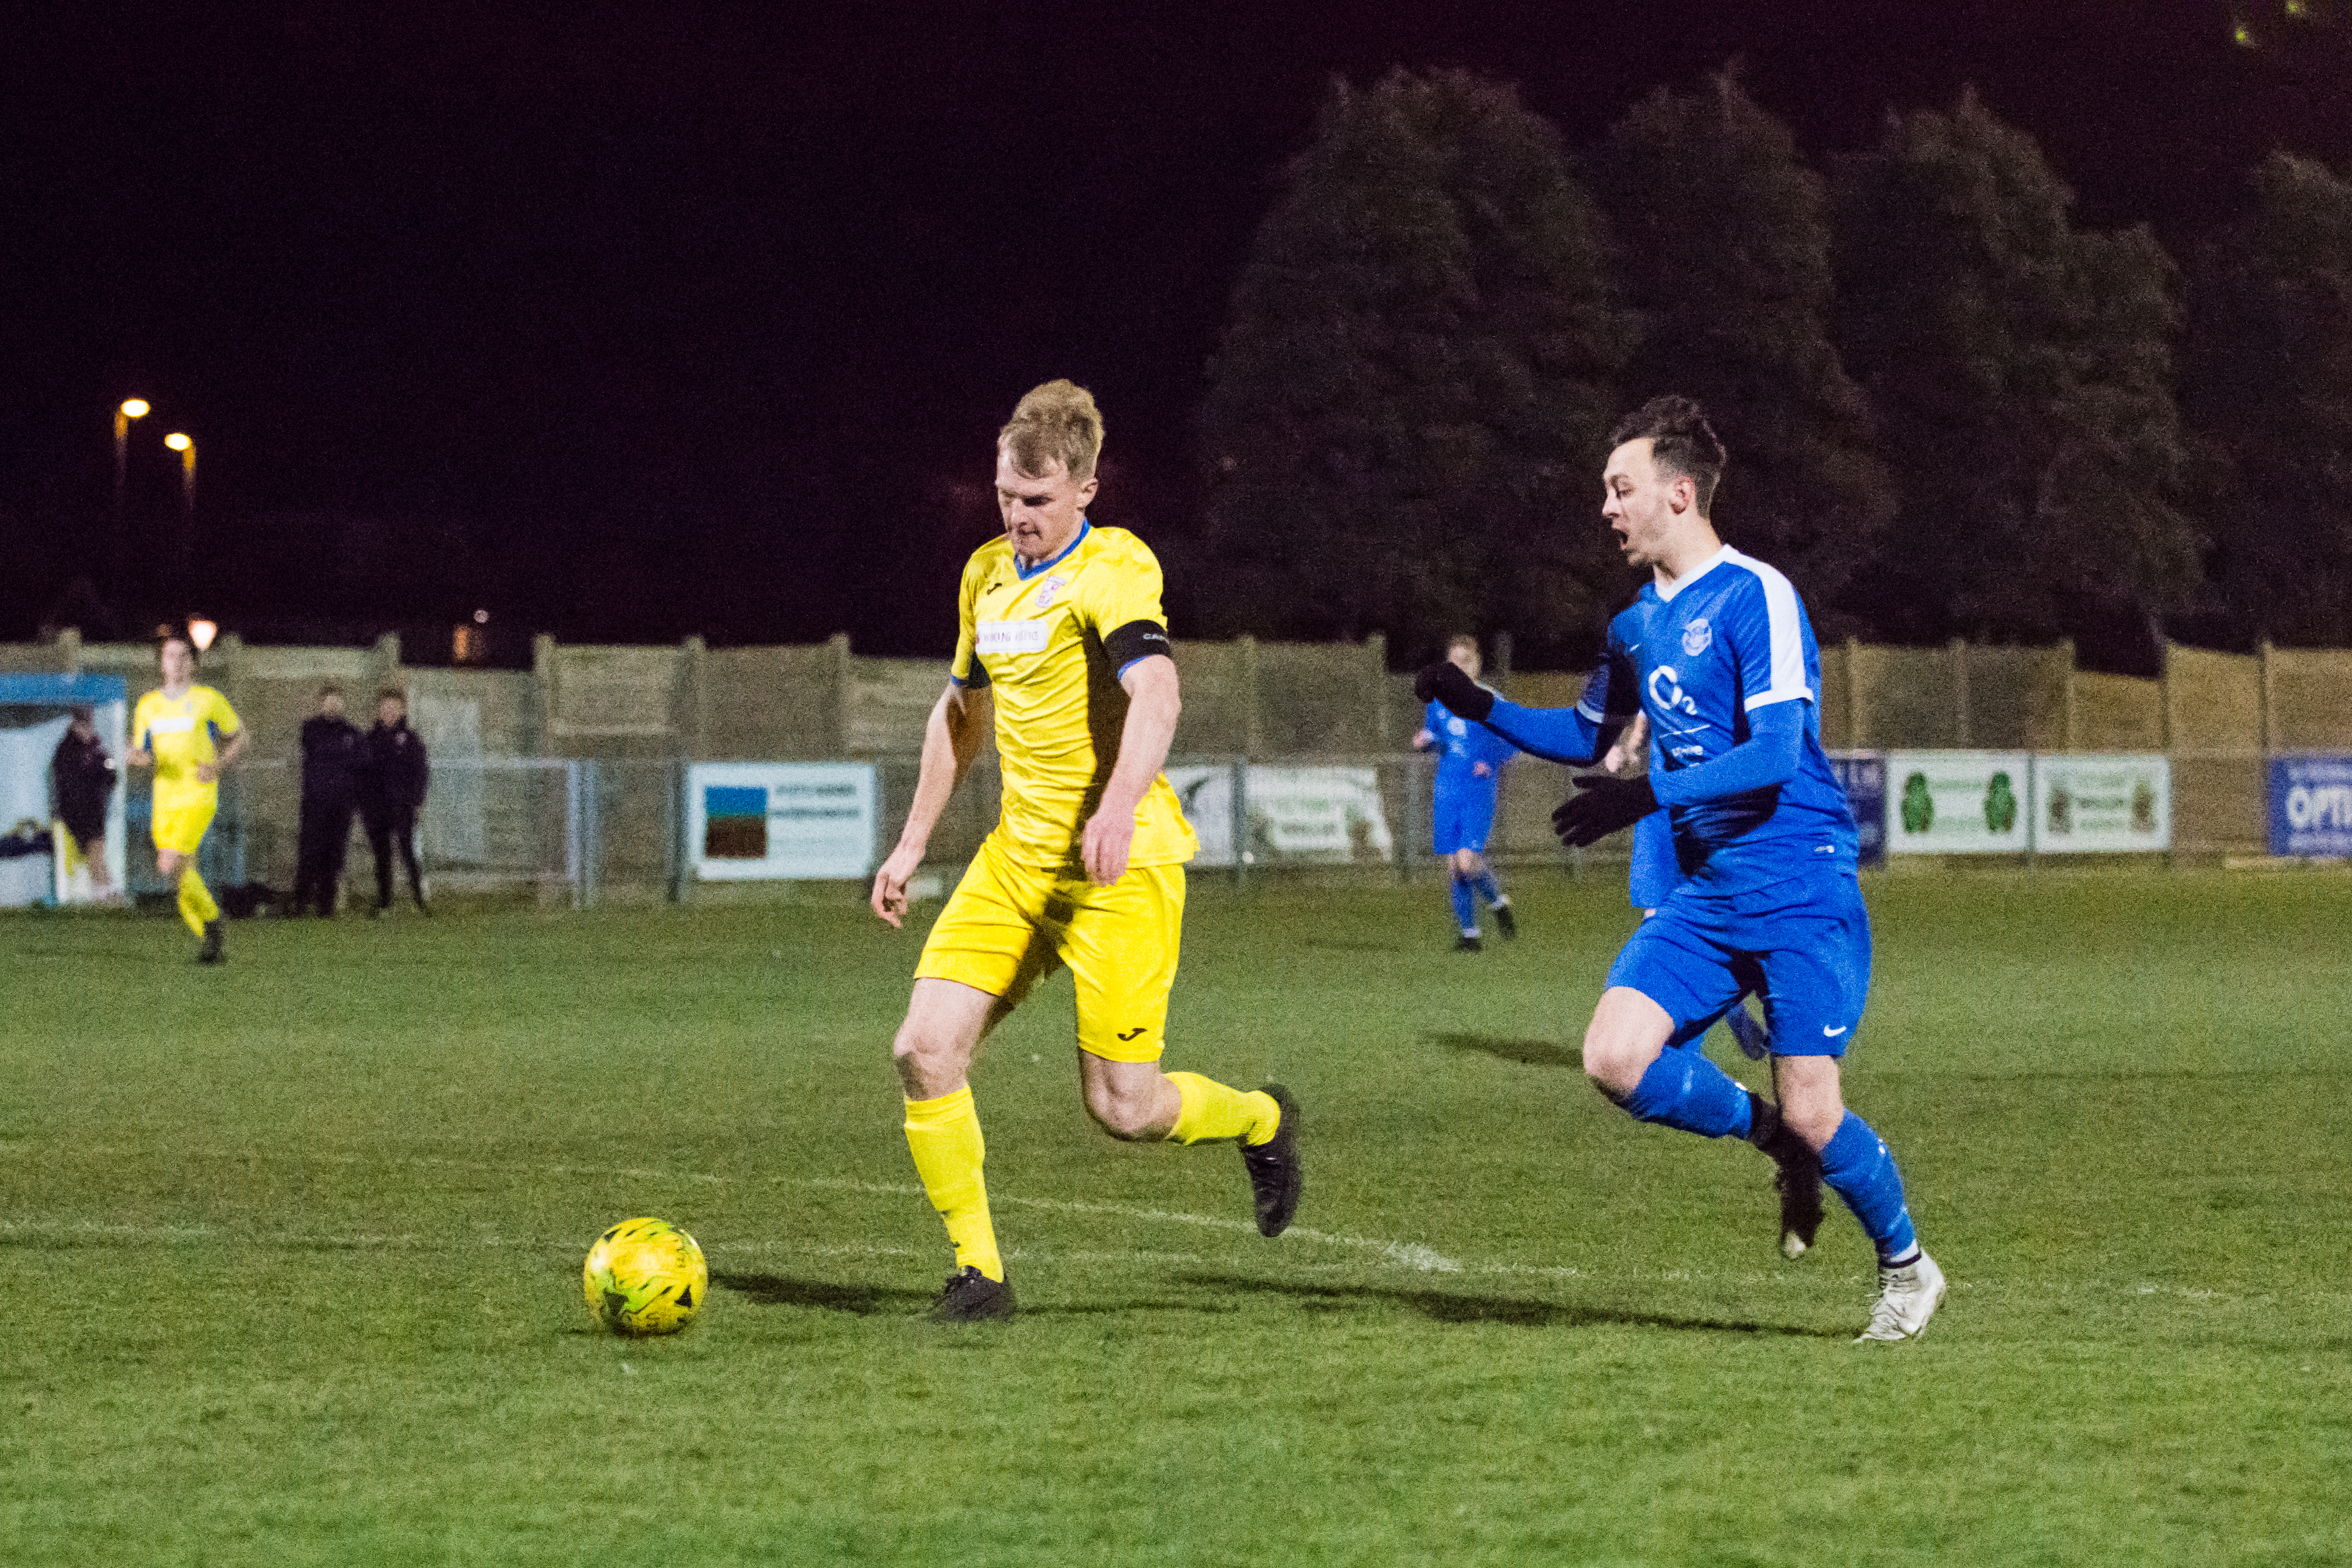 DAVID_JEFFERY Shoreham FC U18s vs Woking FC Academy 22.03.18 37